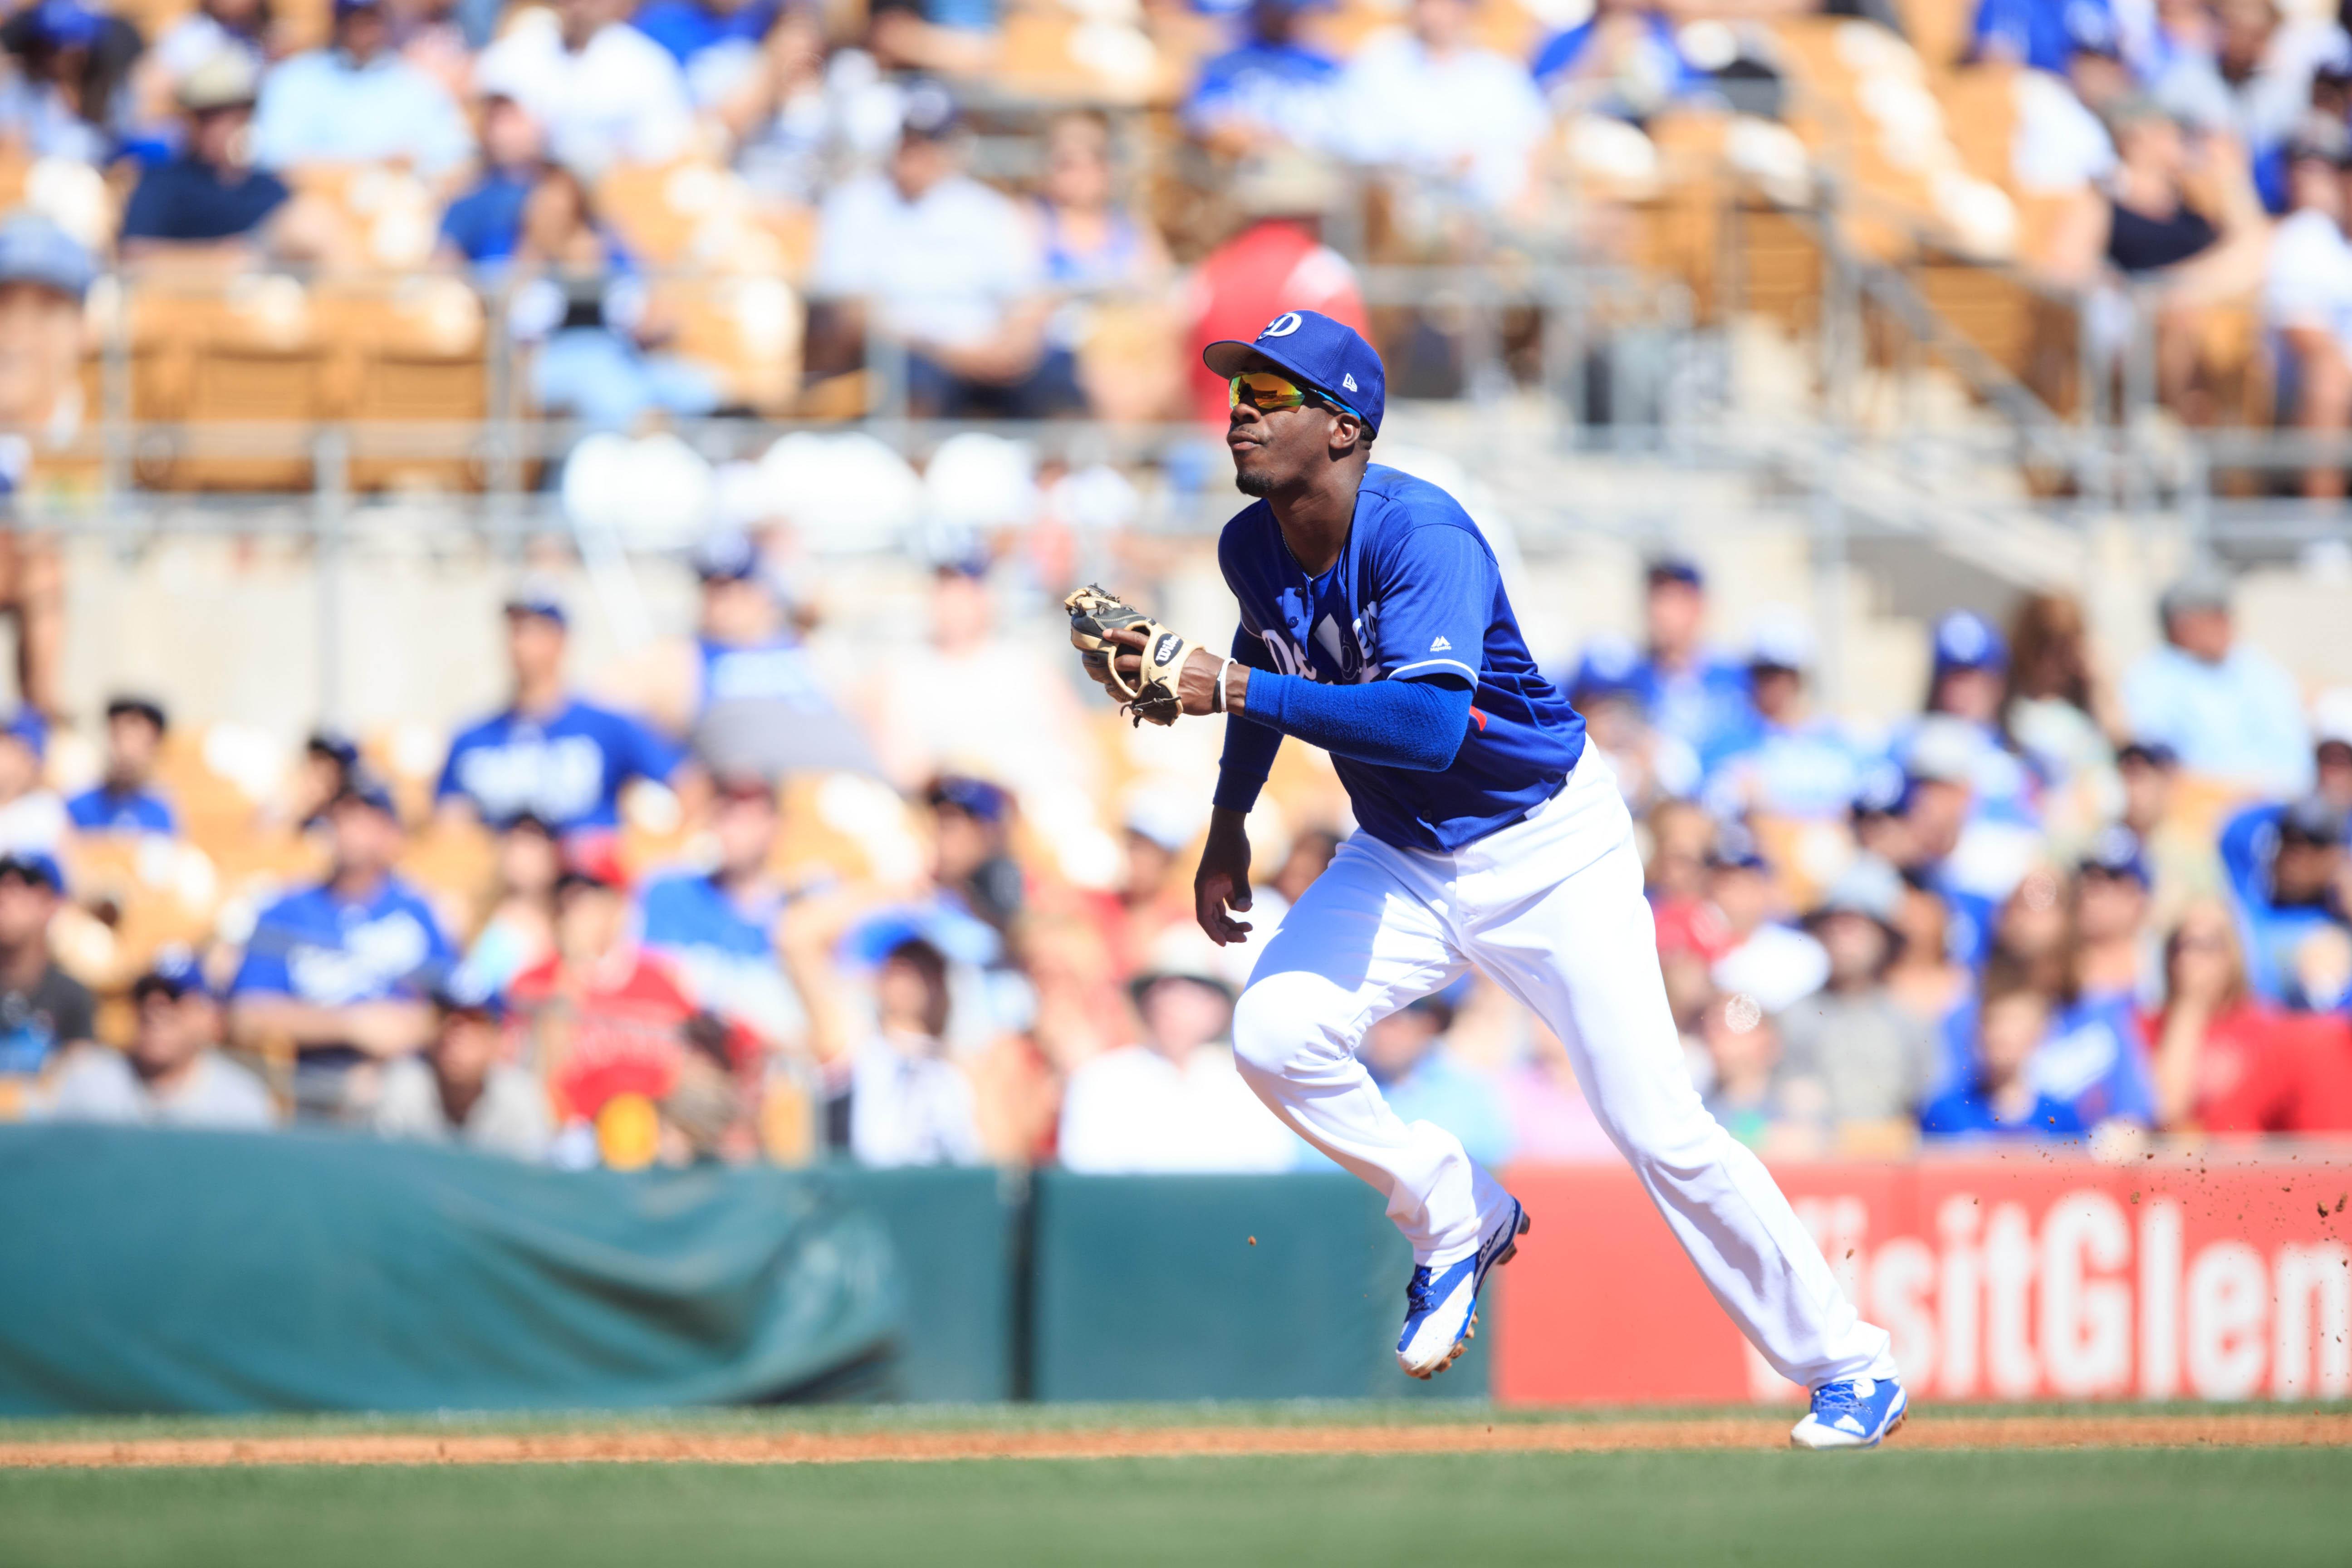 MLB: Spring Training-Los Angeles Angels at Los Angeles Dodgers